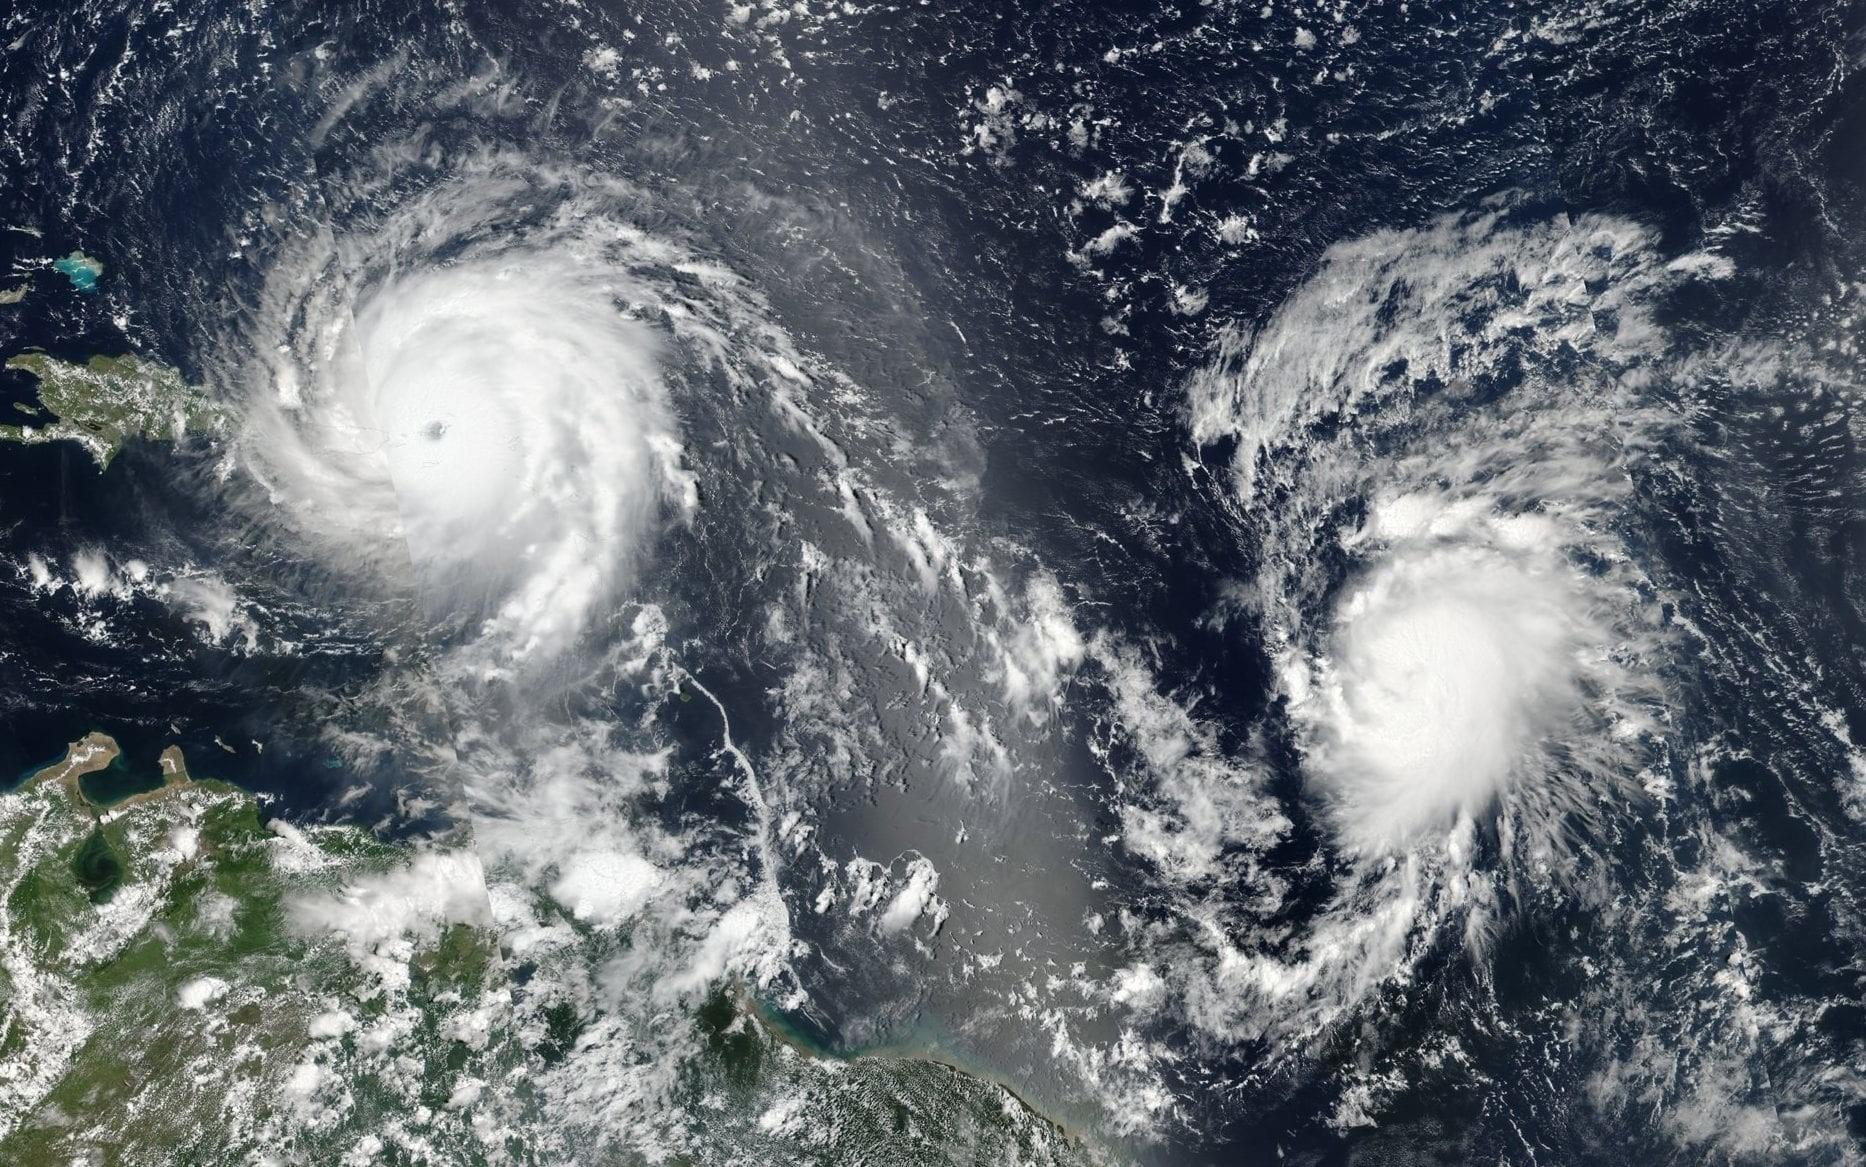 A Nasa satellite image shows Hurricane Irma (left) and Hurricane Jose (right) in the Atlantic Ocean. (Source: NASA)